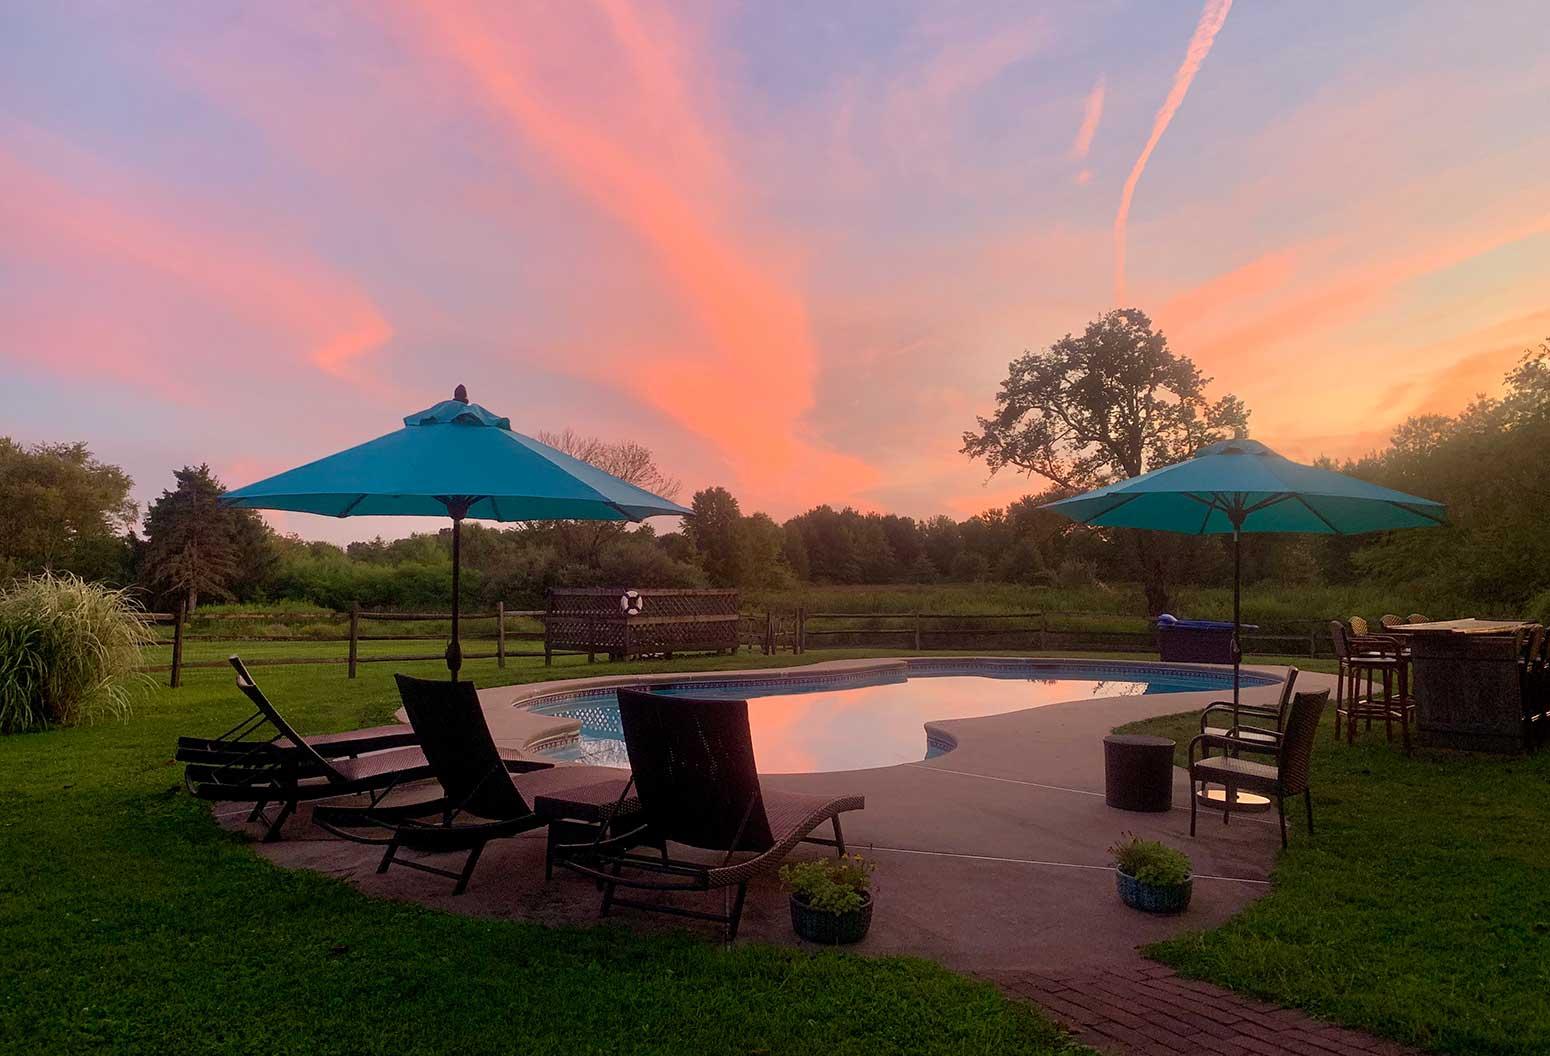 The pool with tiki bar at sunset